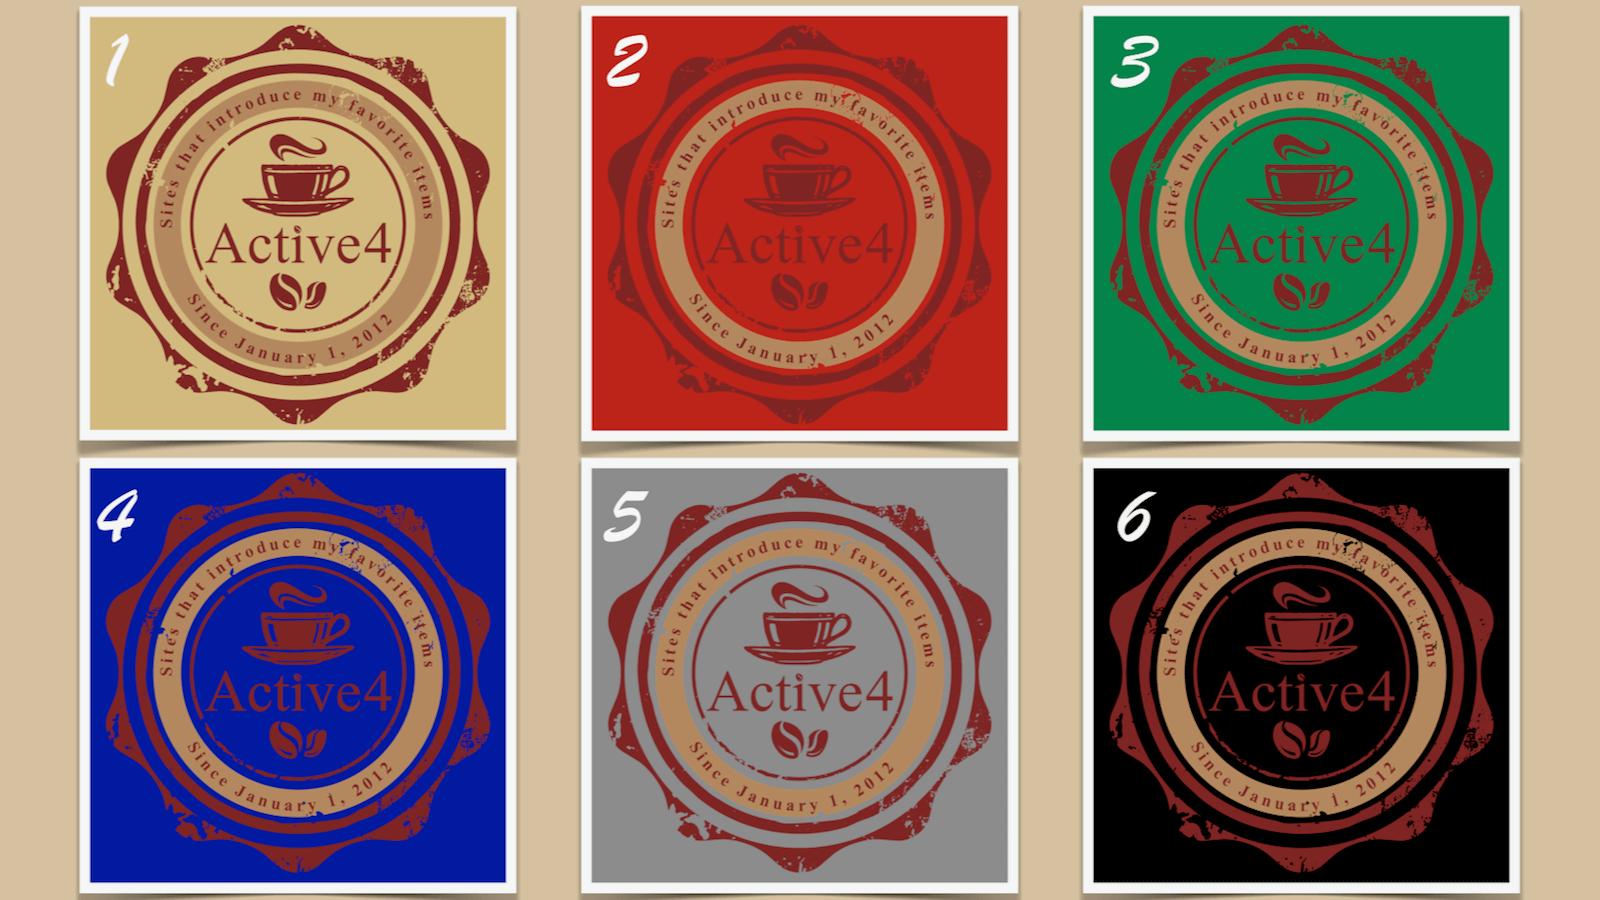 0201 Best color scheme for site logo 003